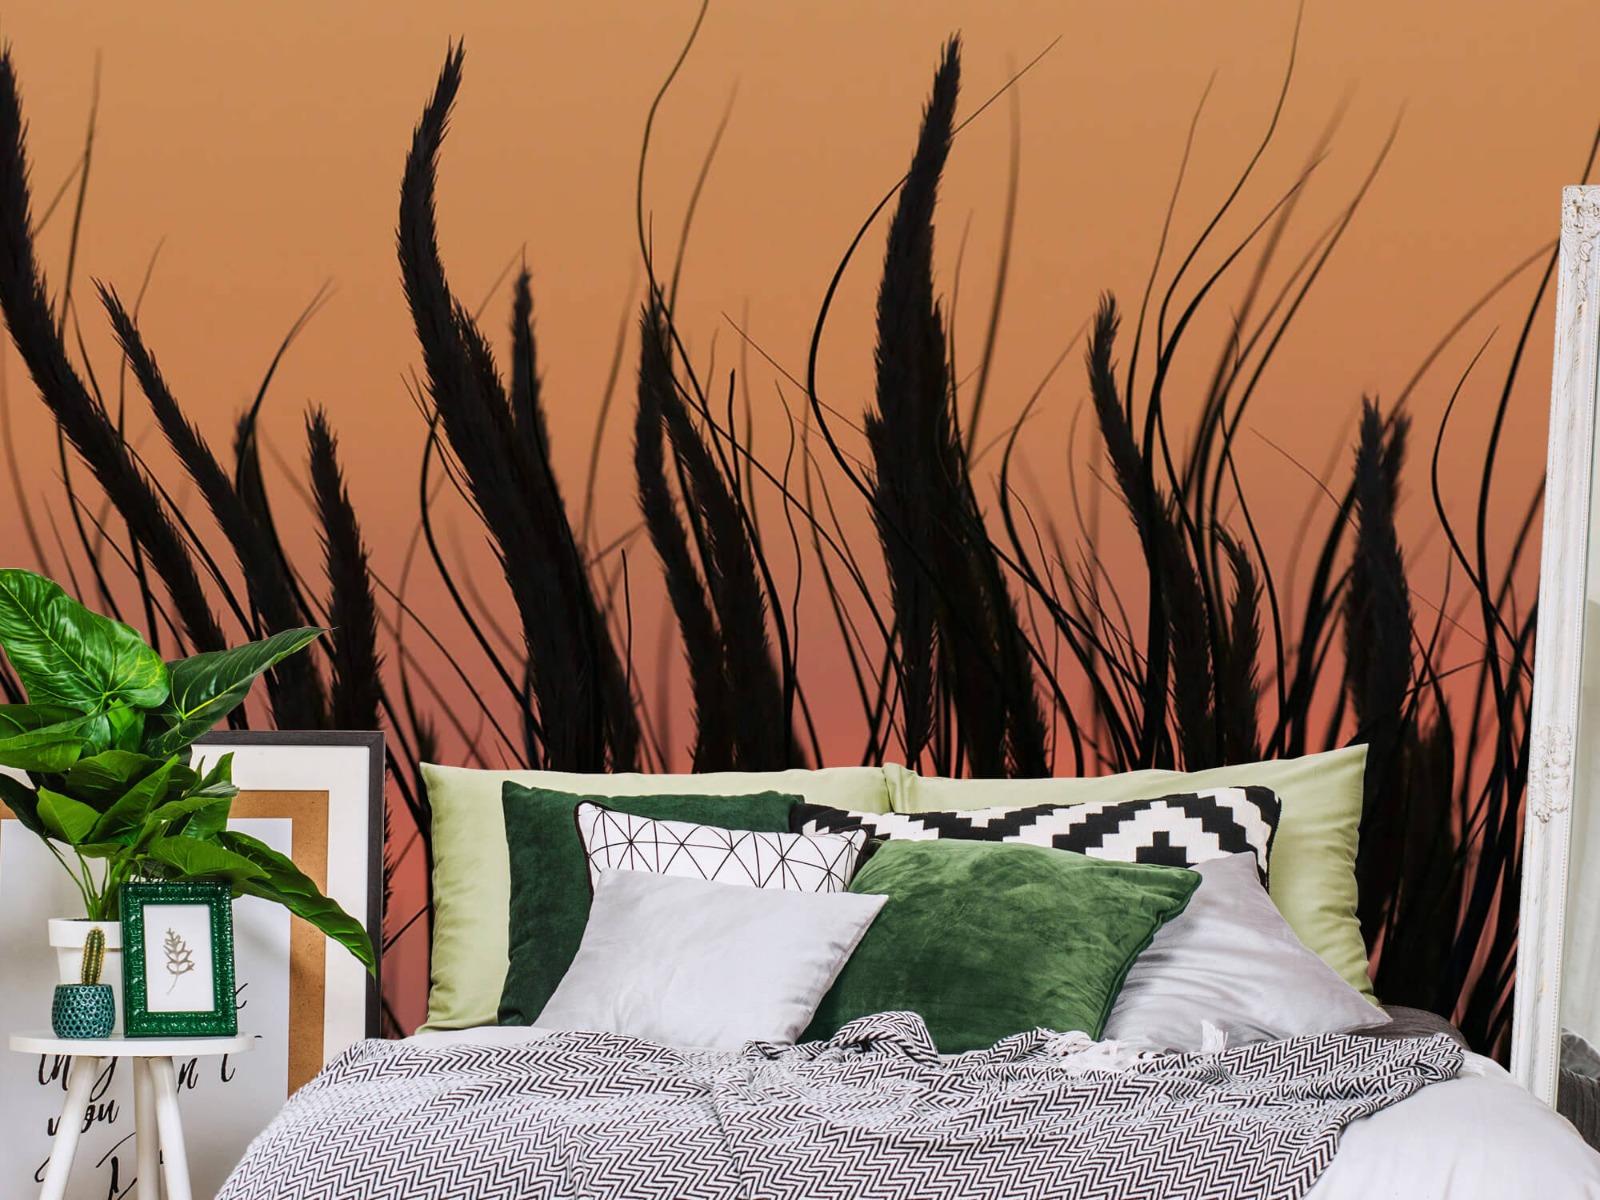 Zomer behang - Helmgras in de avond - Slaapkamer 12